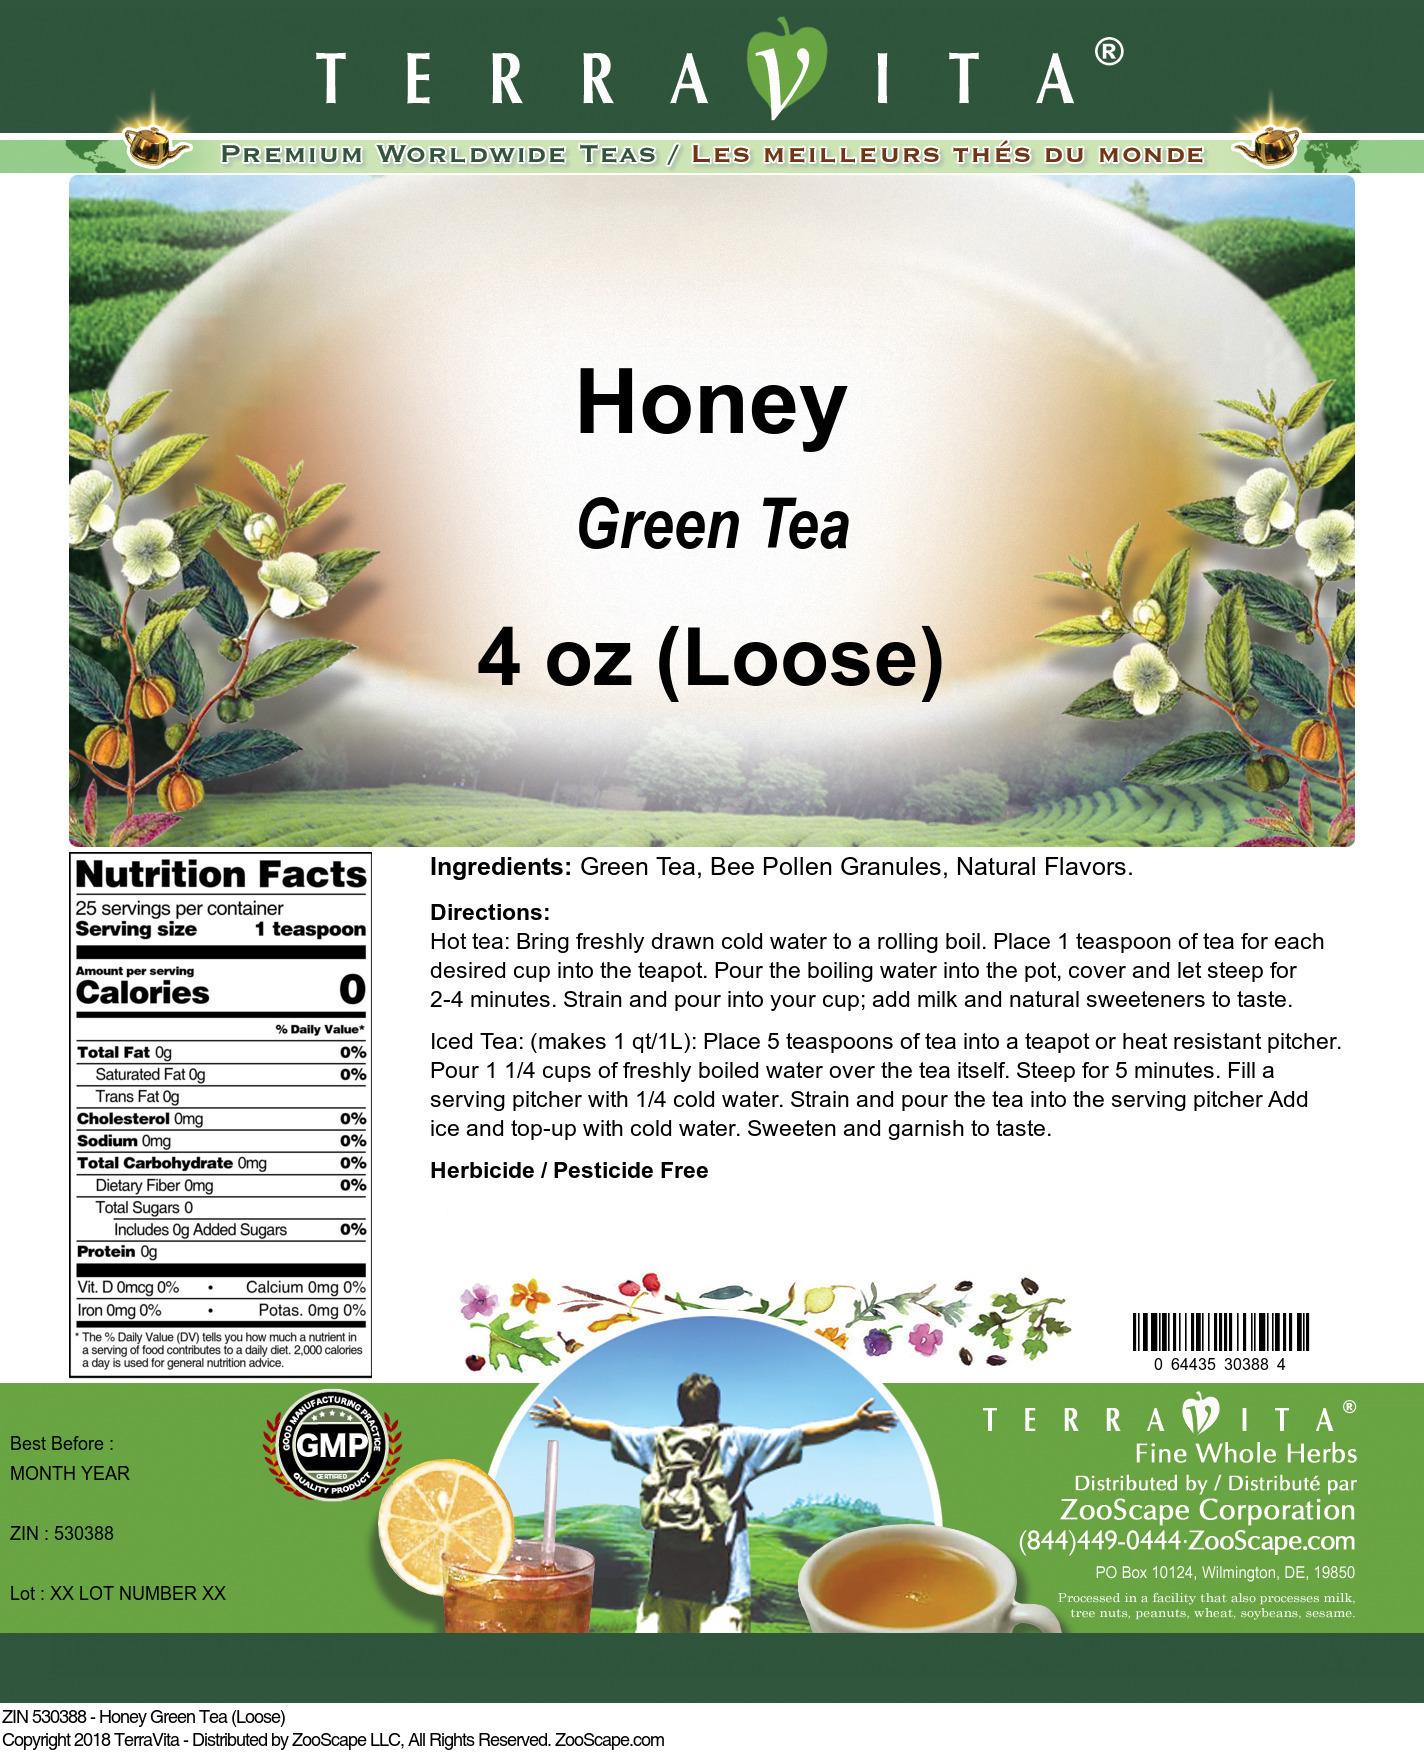 Honey Green Tea (Loose)